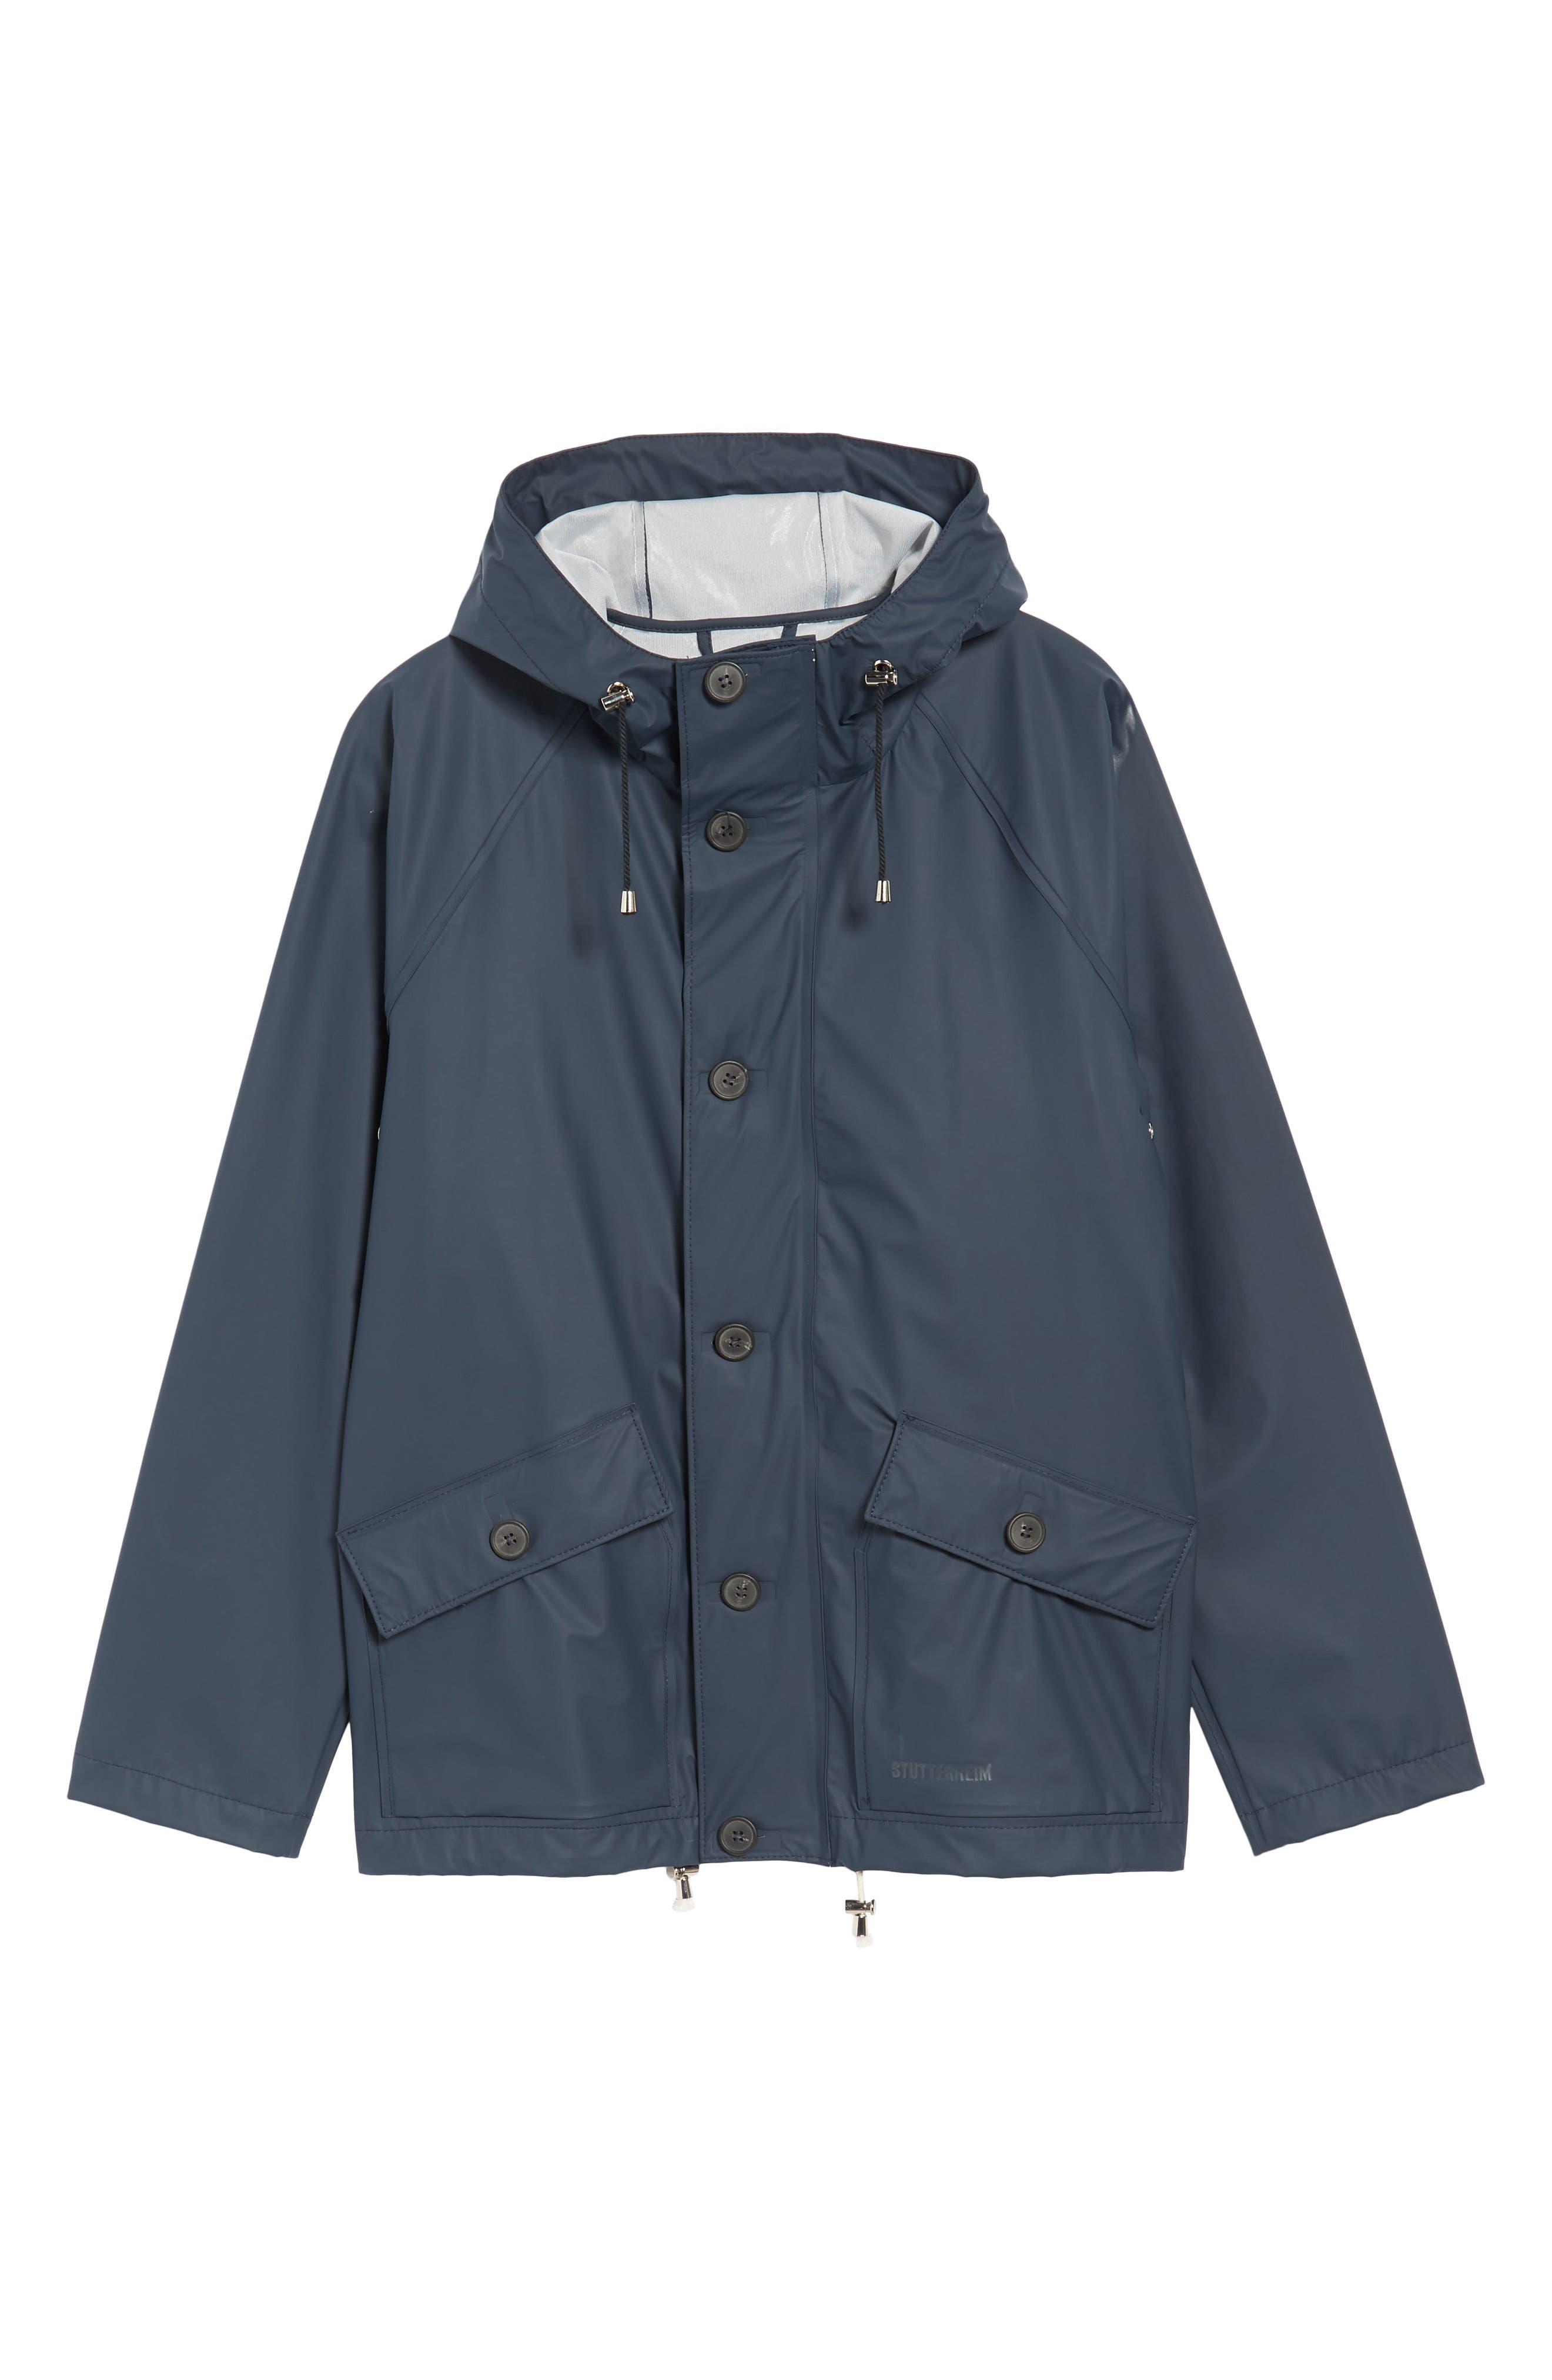 Stenhamra Classic Fit Jacket,                             Alternate thumbnail 5, color,                             NAVY